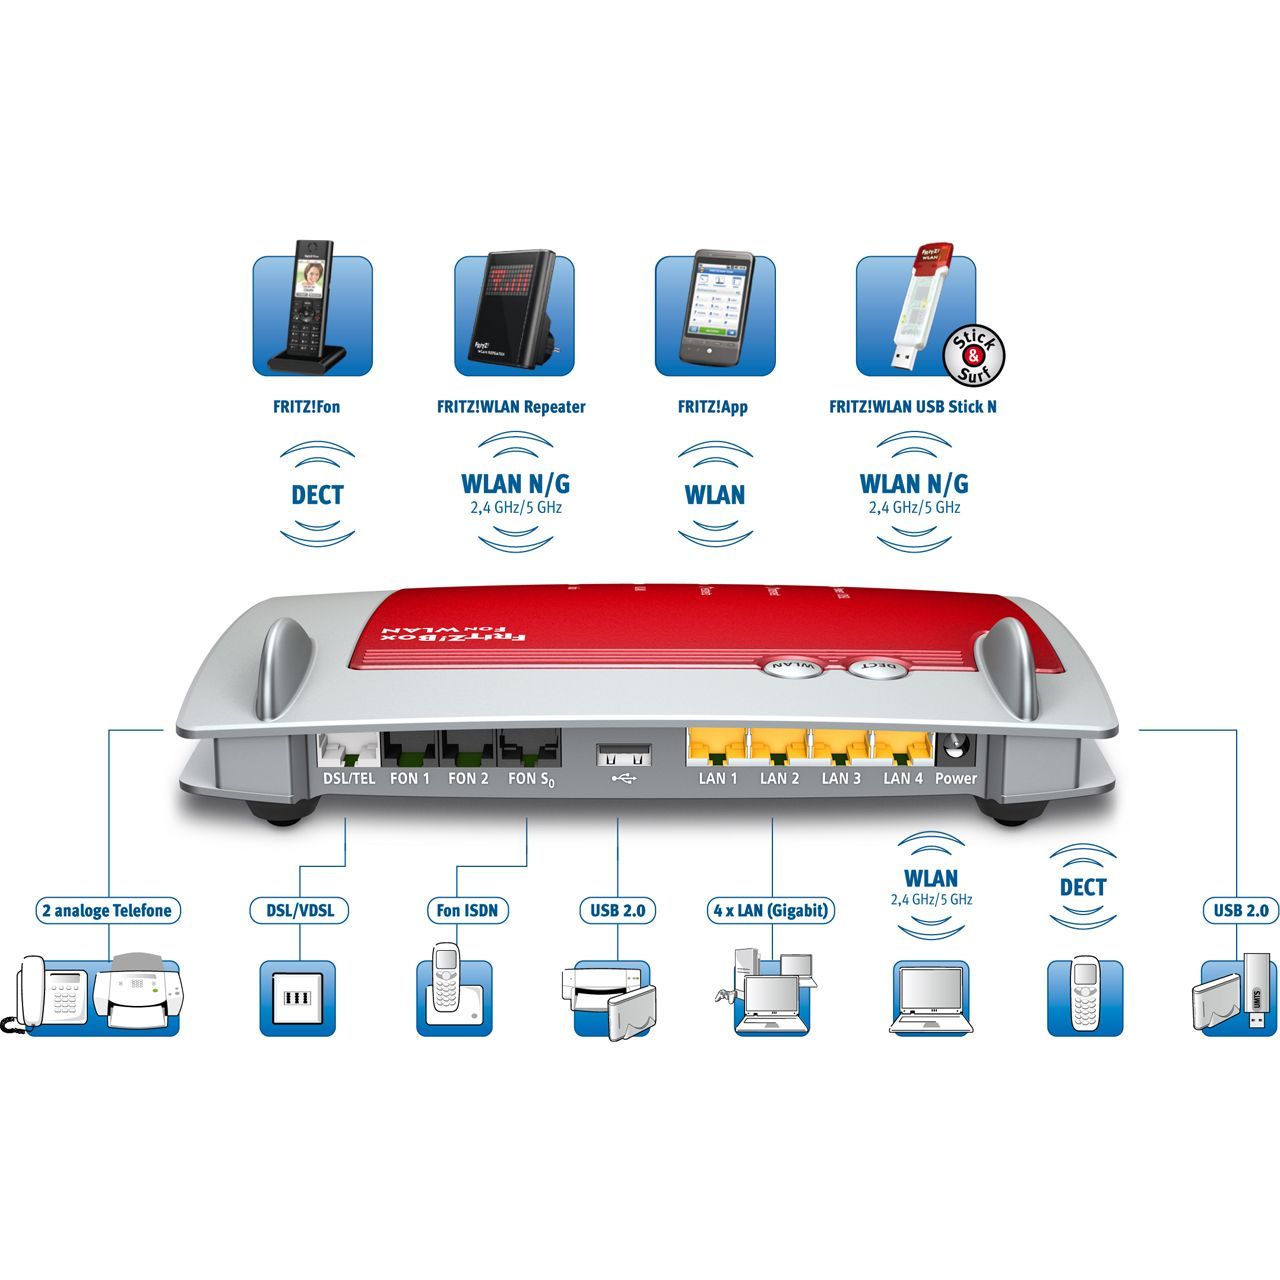 AVM FRITBox 7390 4 Port Router 300Mbit/s - WLAN Router + Modem ...